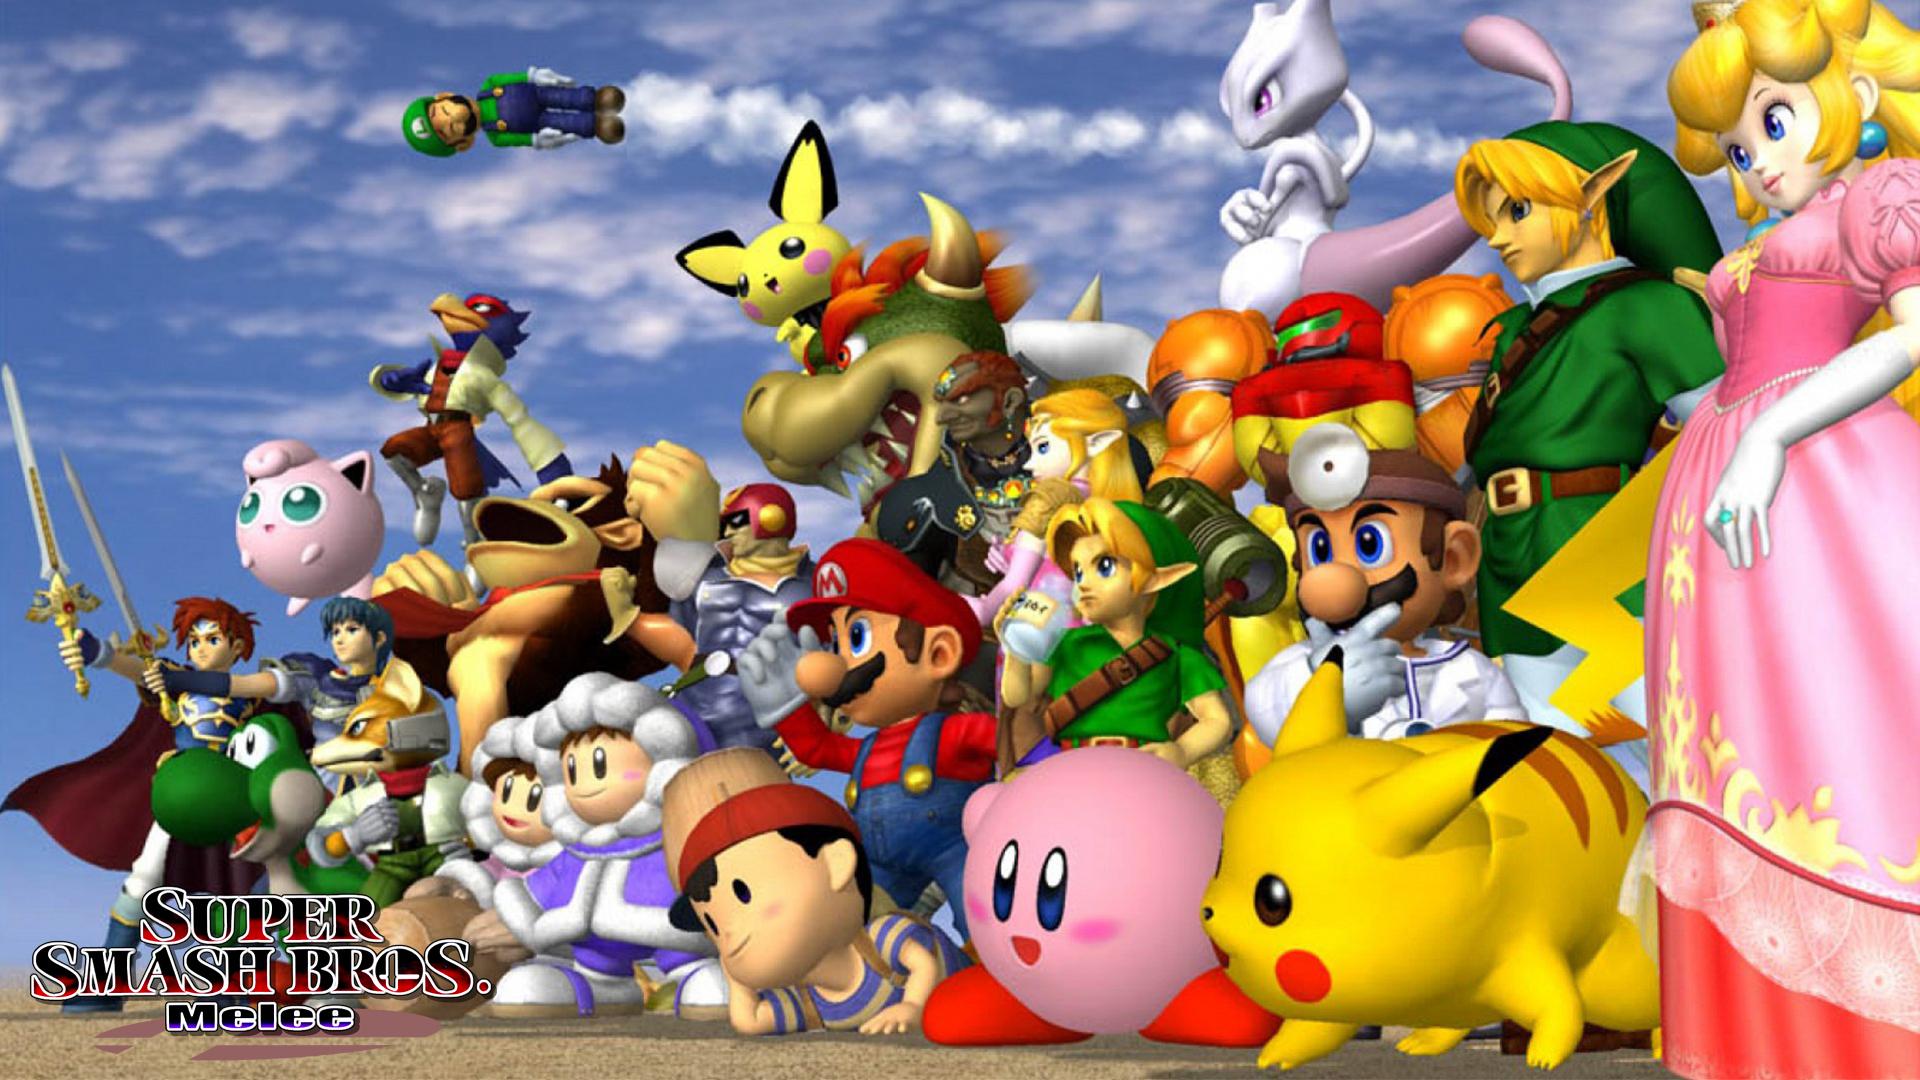 15:30 - Smash Bros. Melee